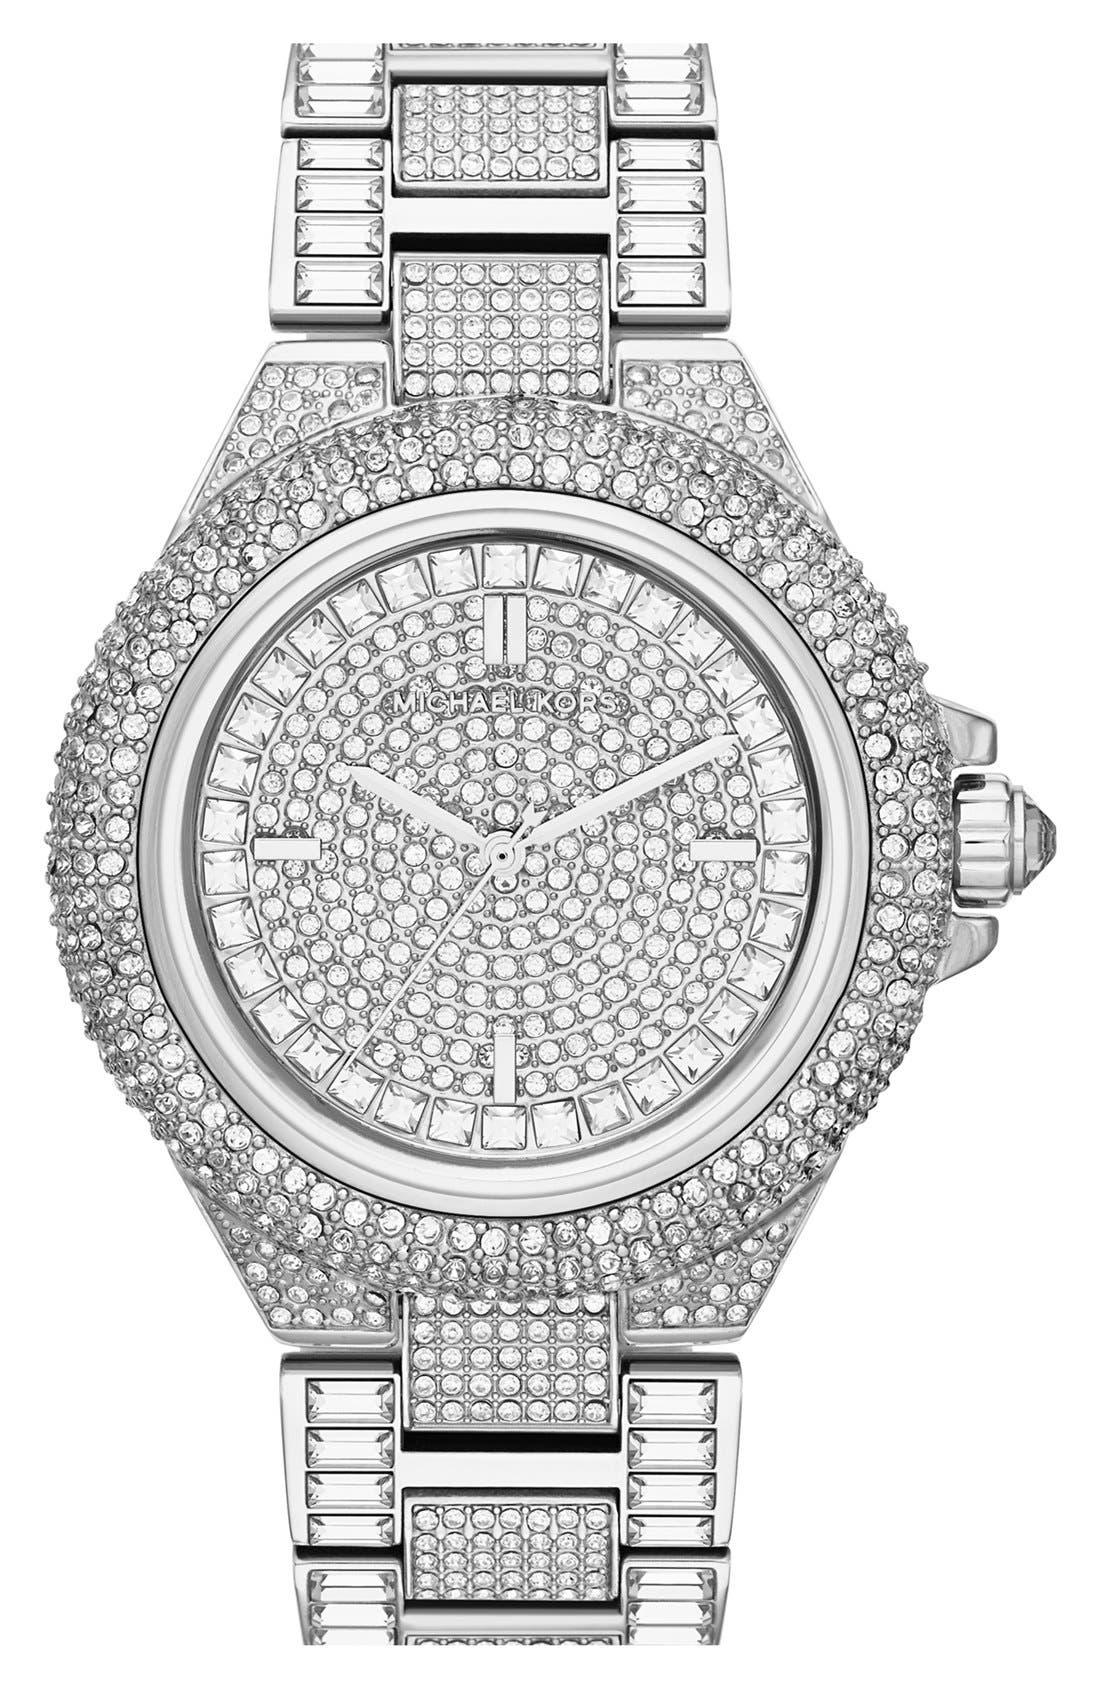 Michael Kors 'Camille' Crystal Encrusted Bracelet Watch, 44mm